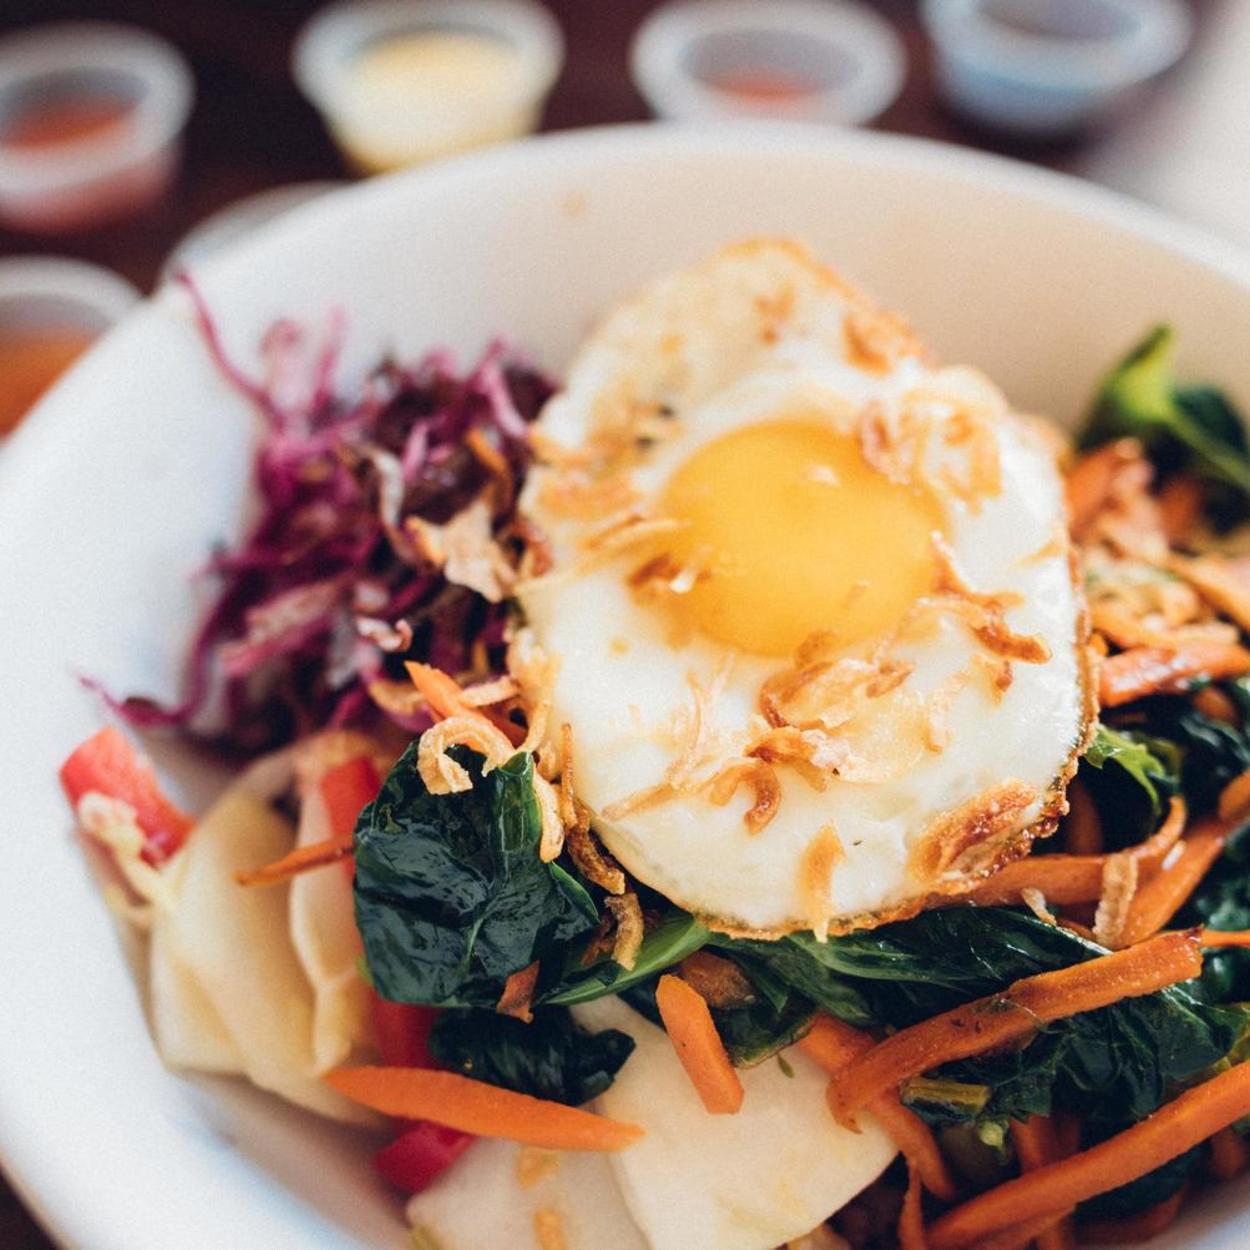 Nha minh healthy vietnamese bowls in brooklyn